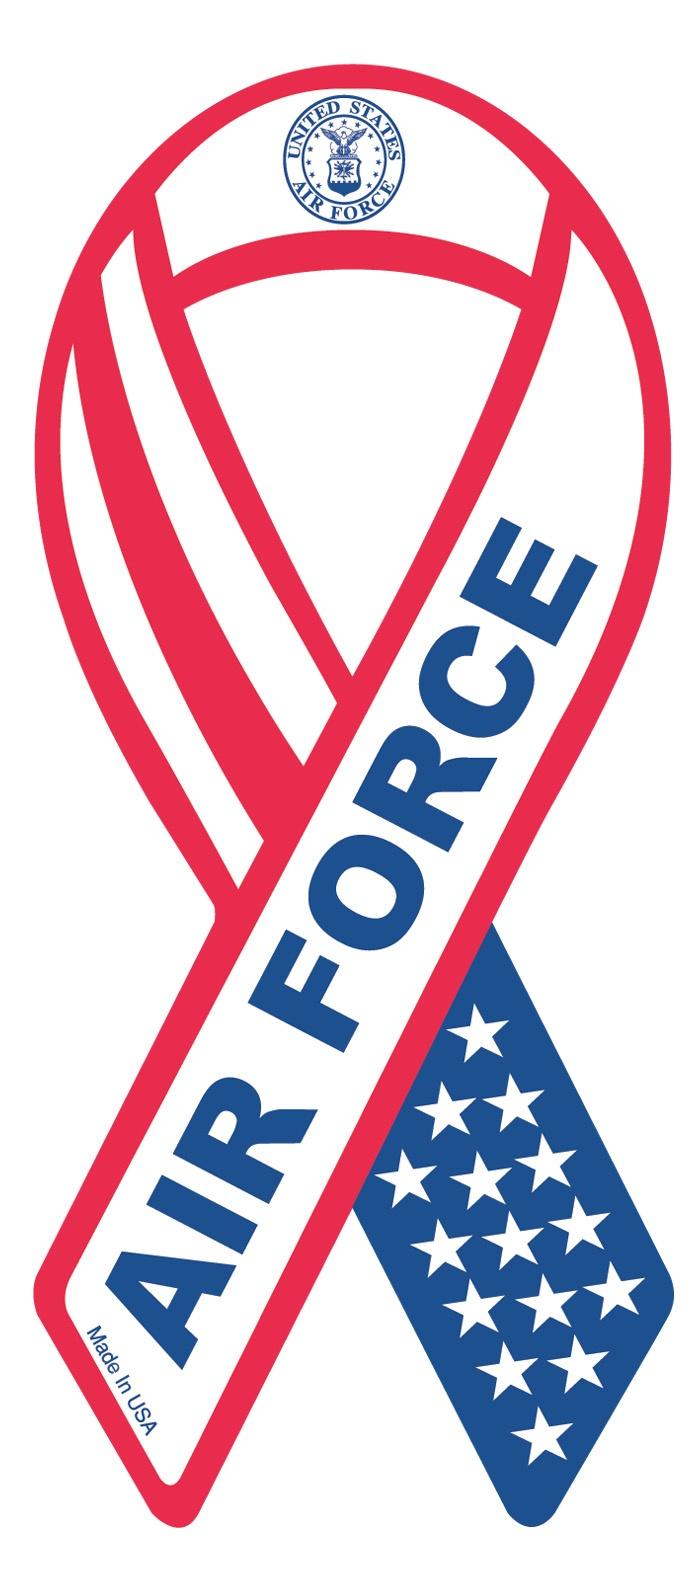 US Air Force Ribbon Magnet, $1.99